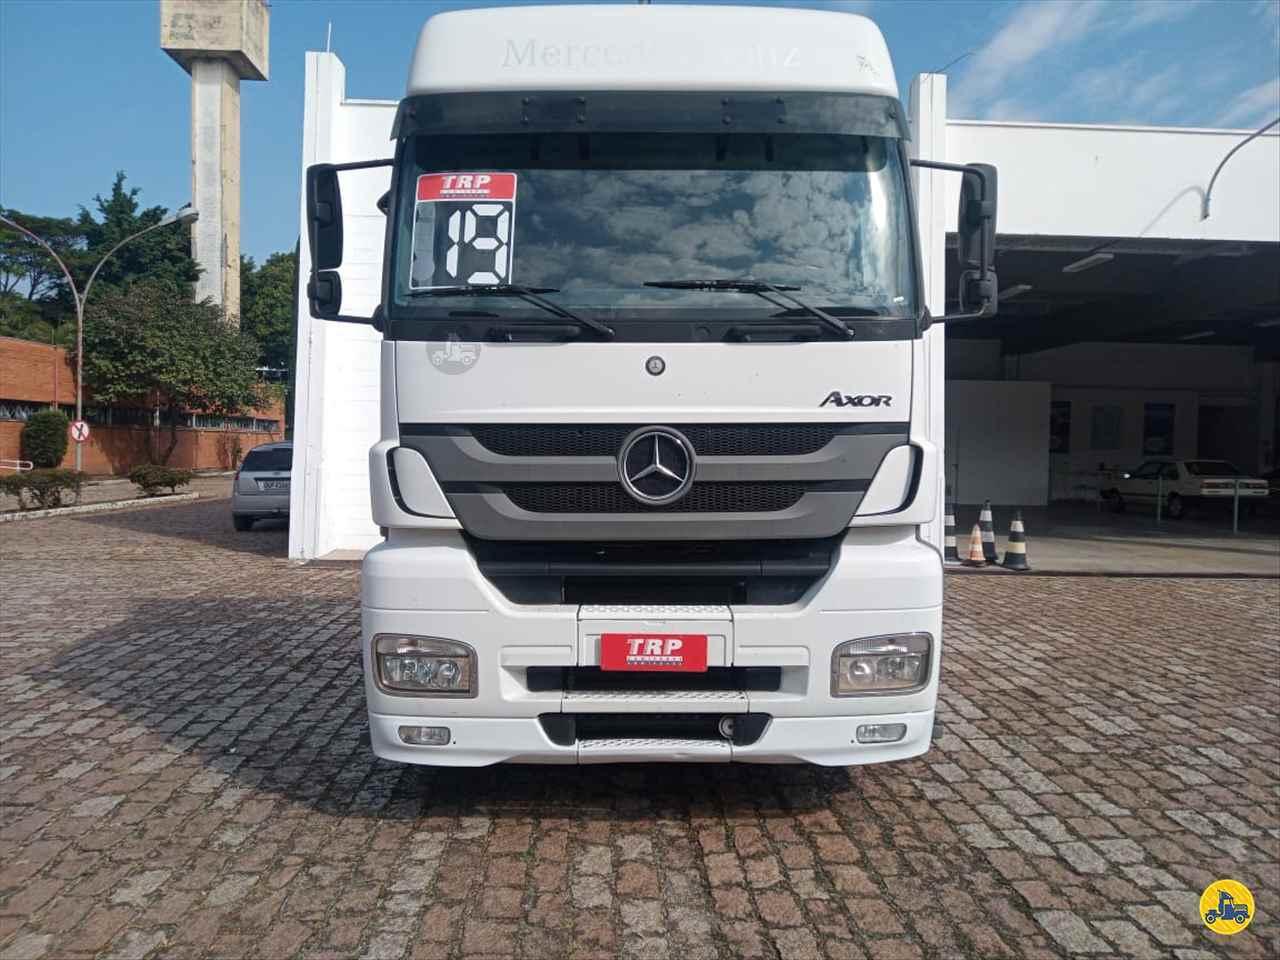 CAMINHAO MERCEDES-BENZ MB 2544 Cavalo Mecânico Truck 6x2 TRP Seminovos ITAJAI SANTA CATARINA SC